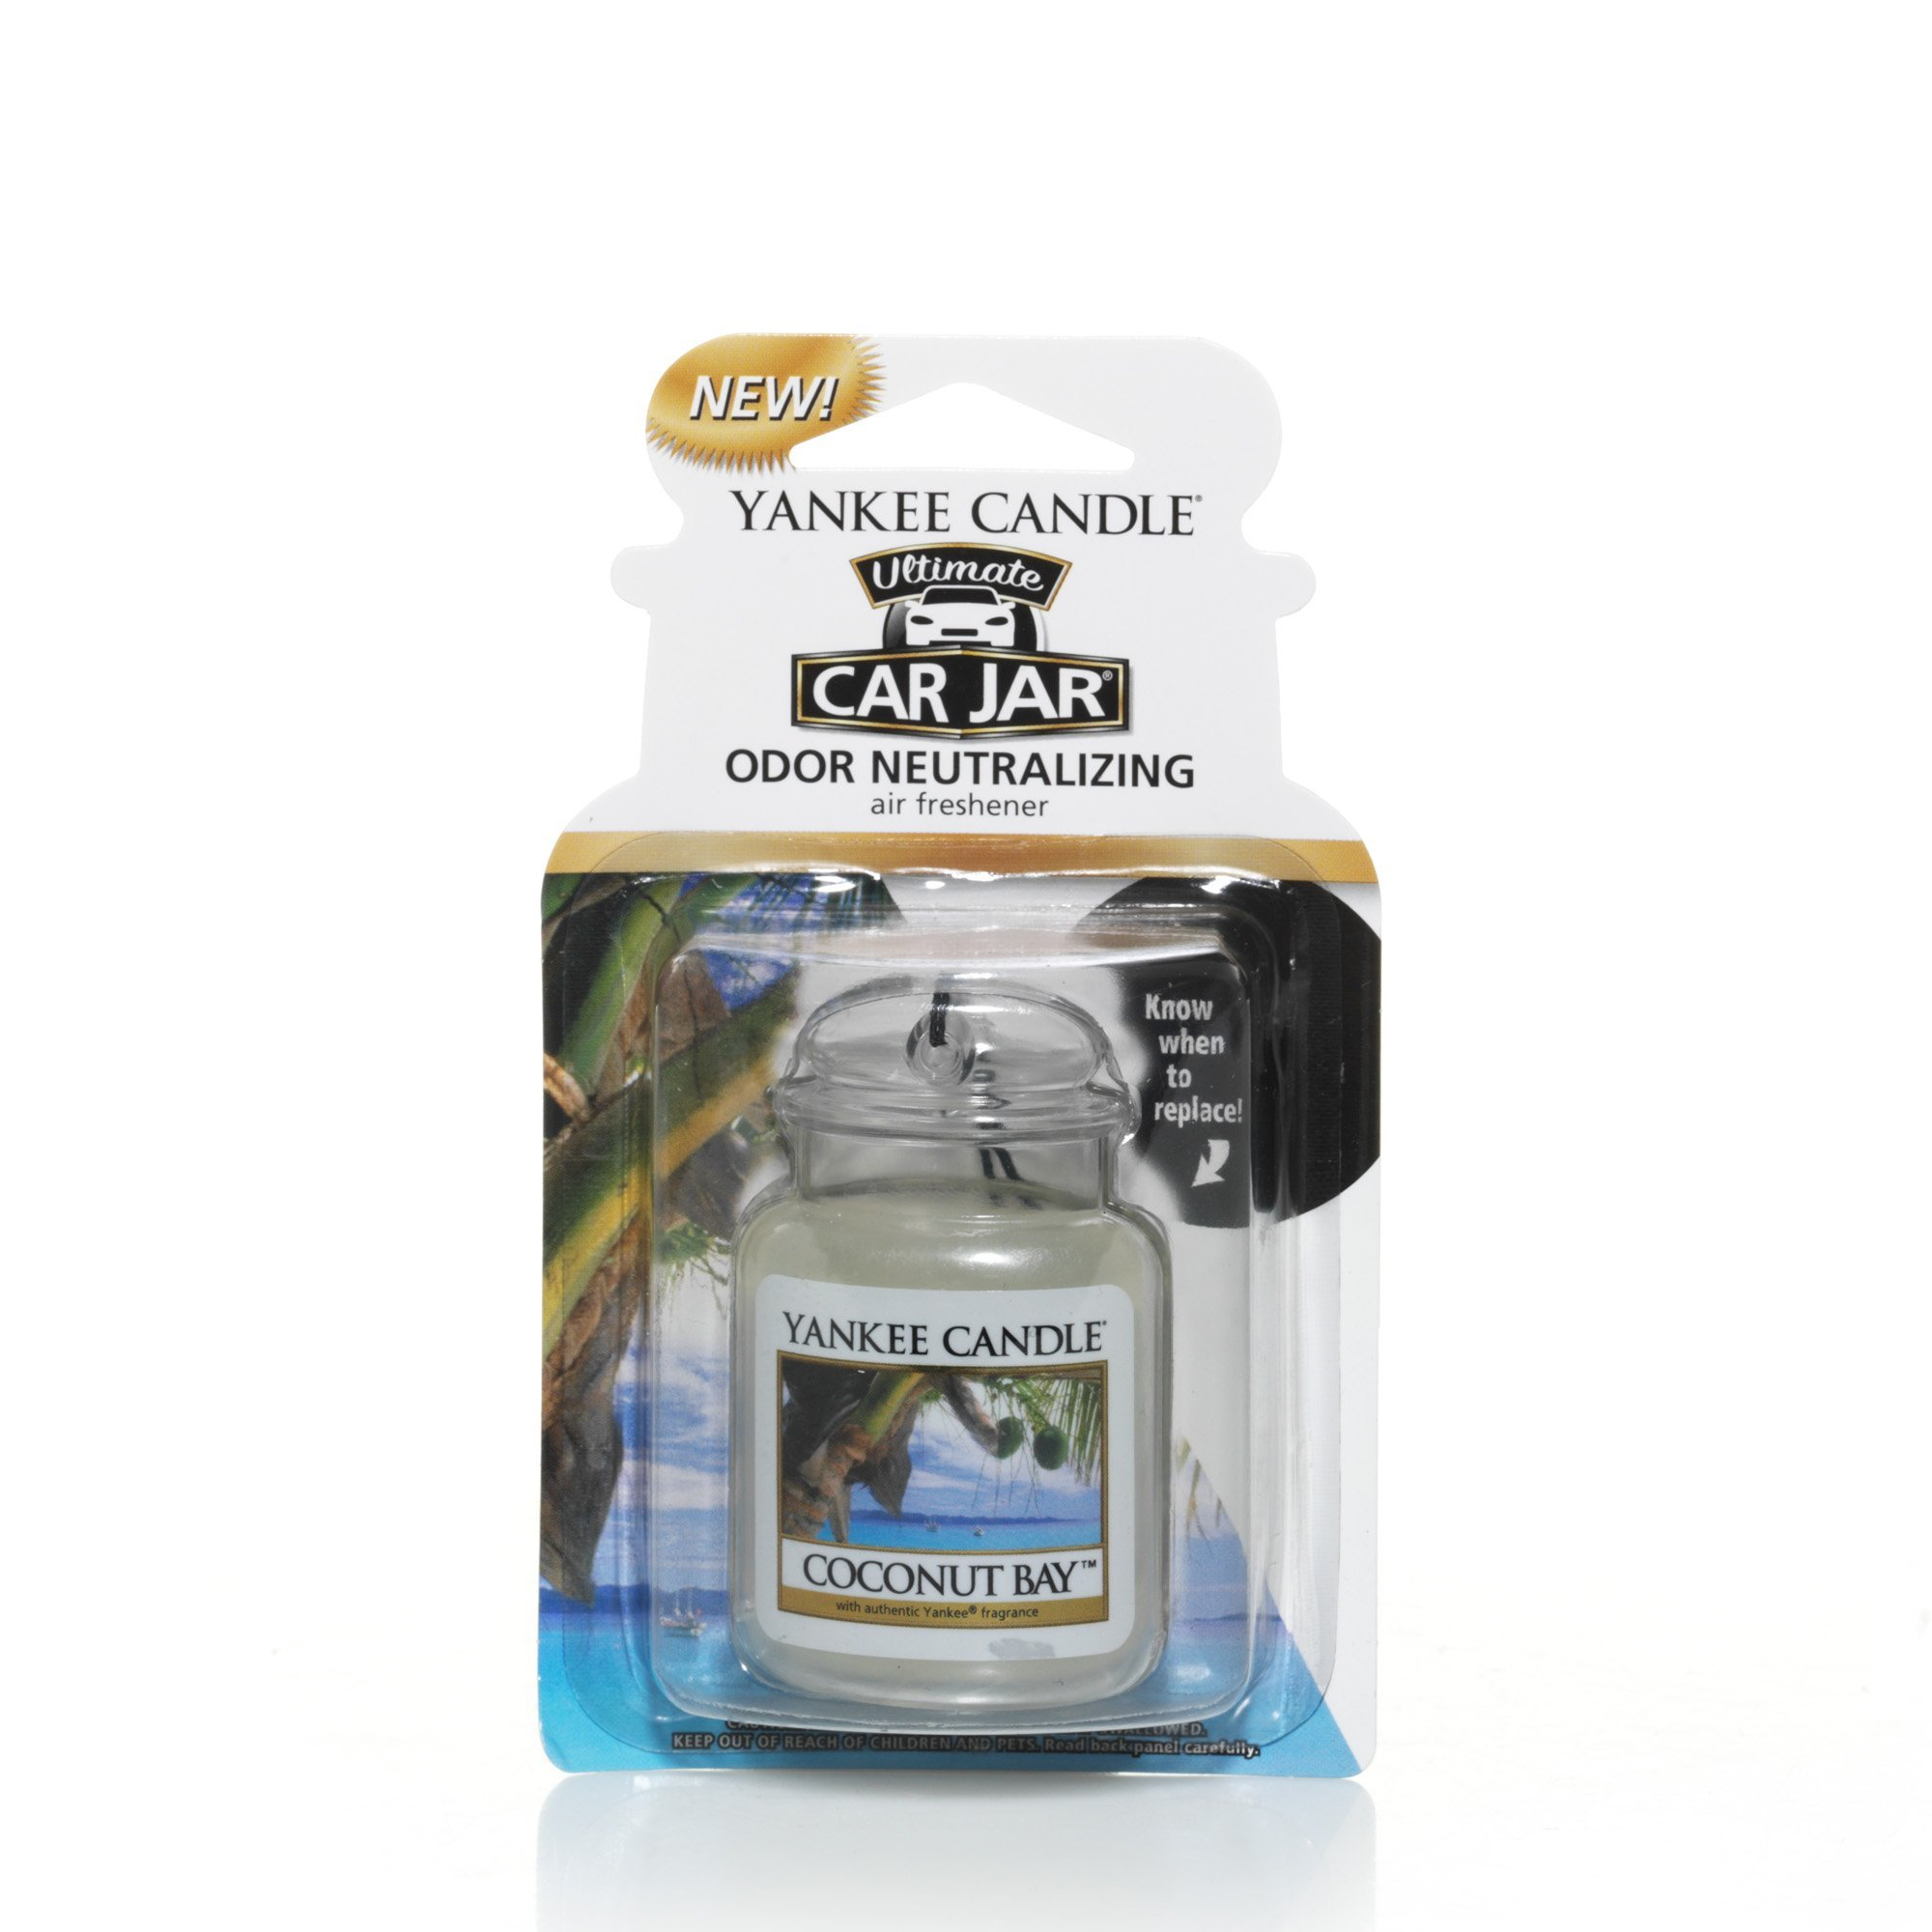 Yankee Candle Car Jar Ultimate, Coconut Bay